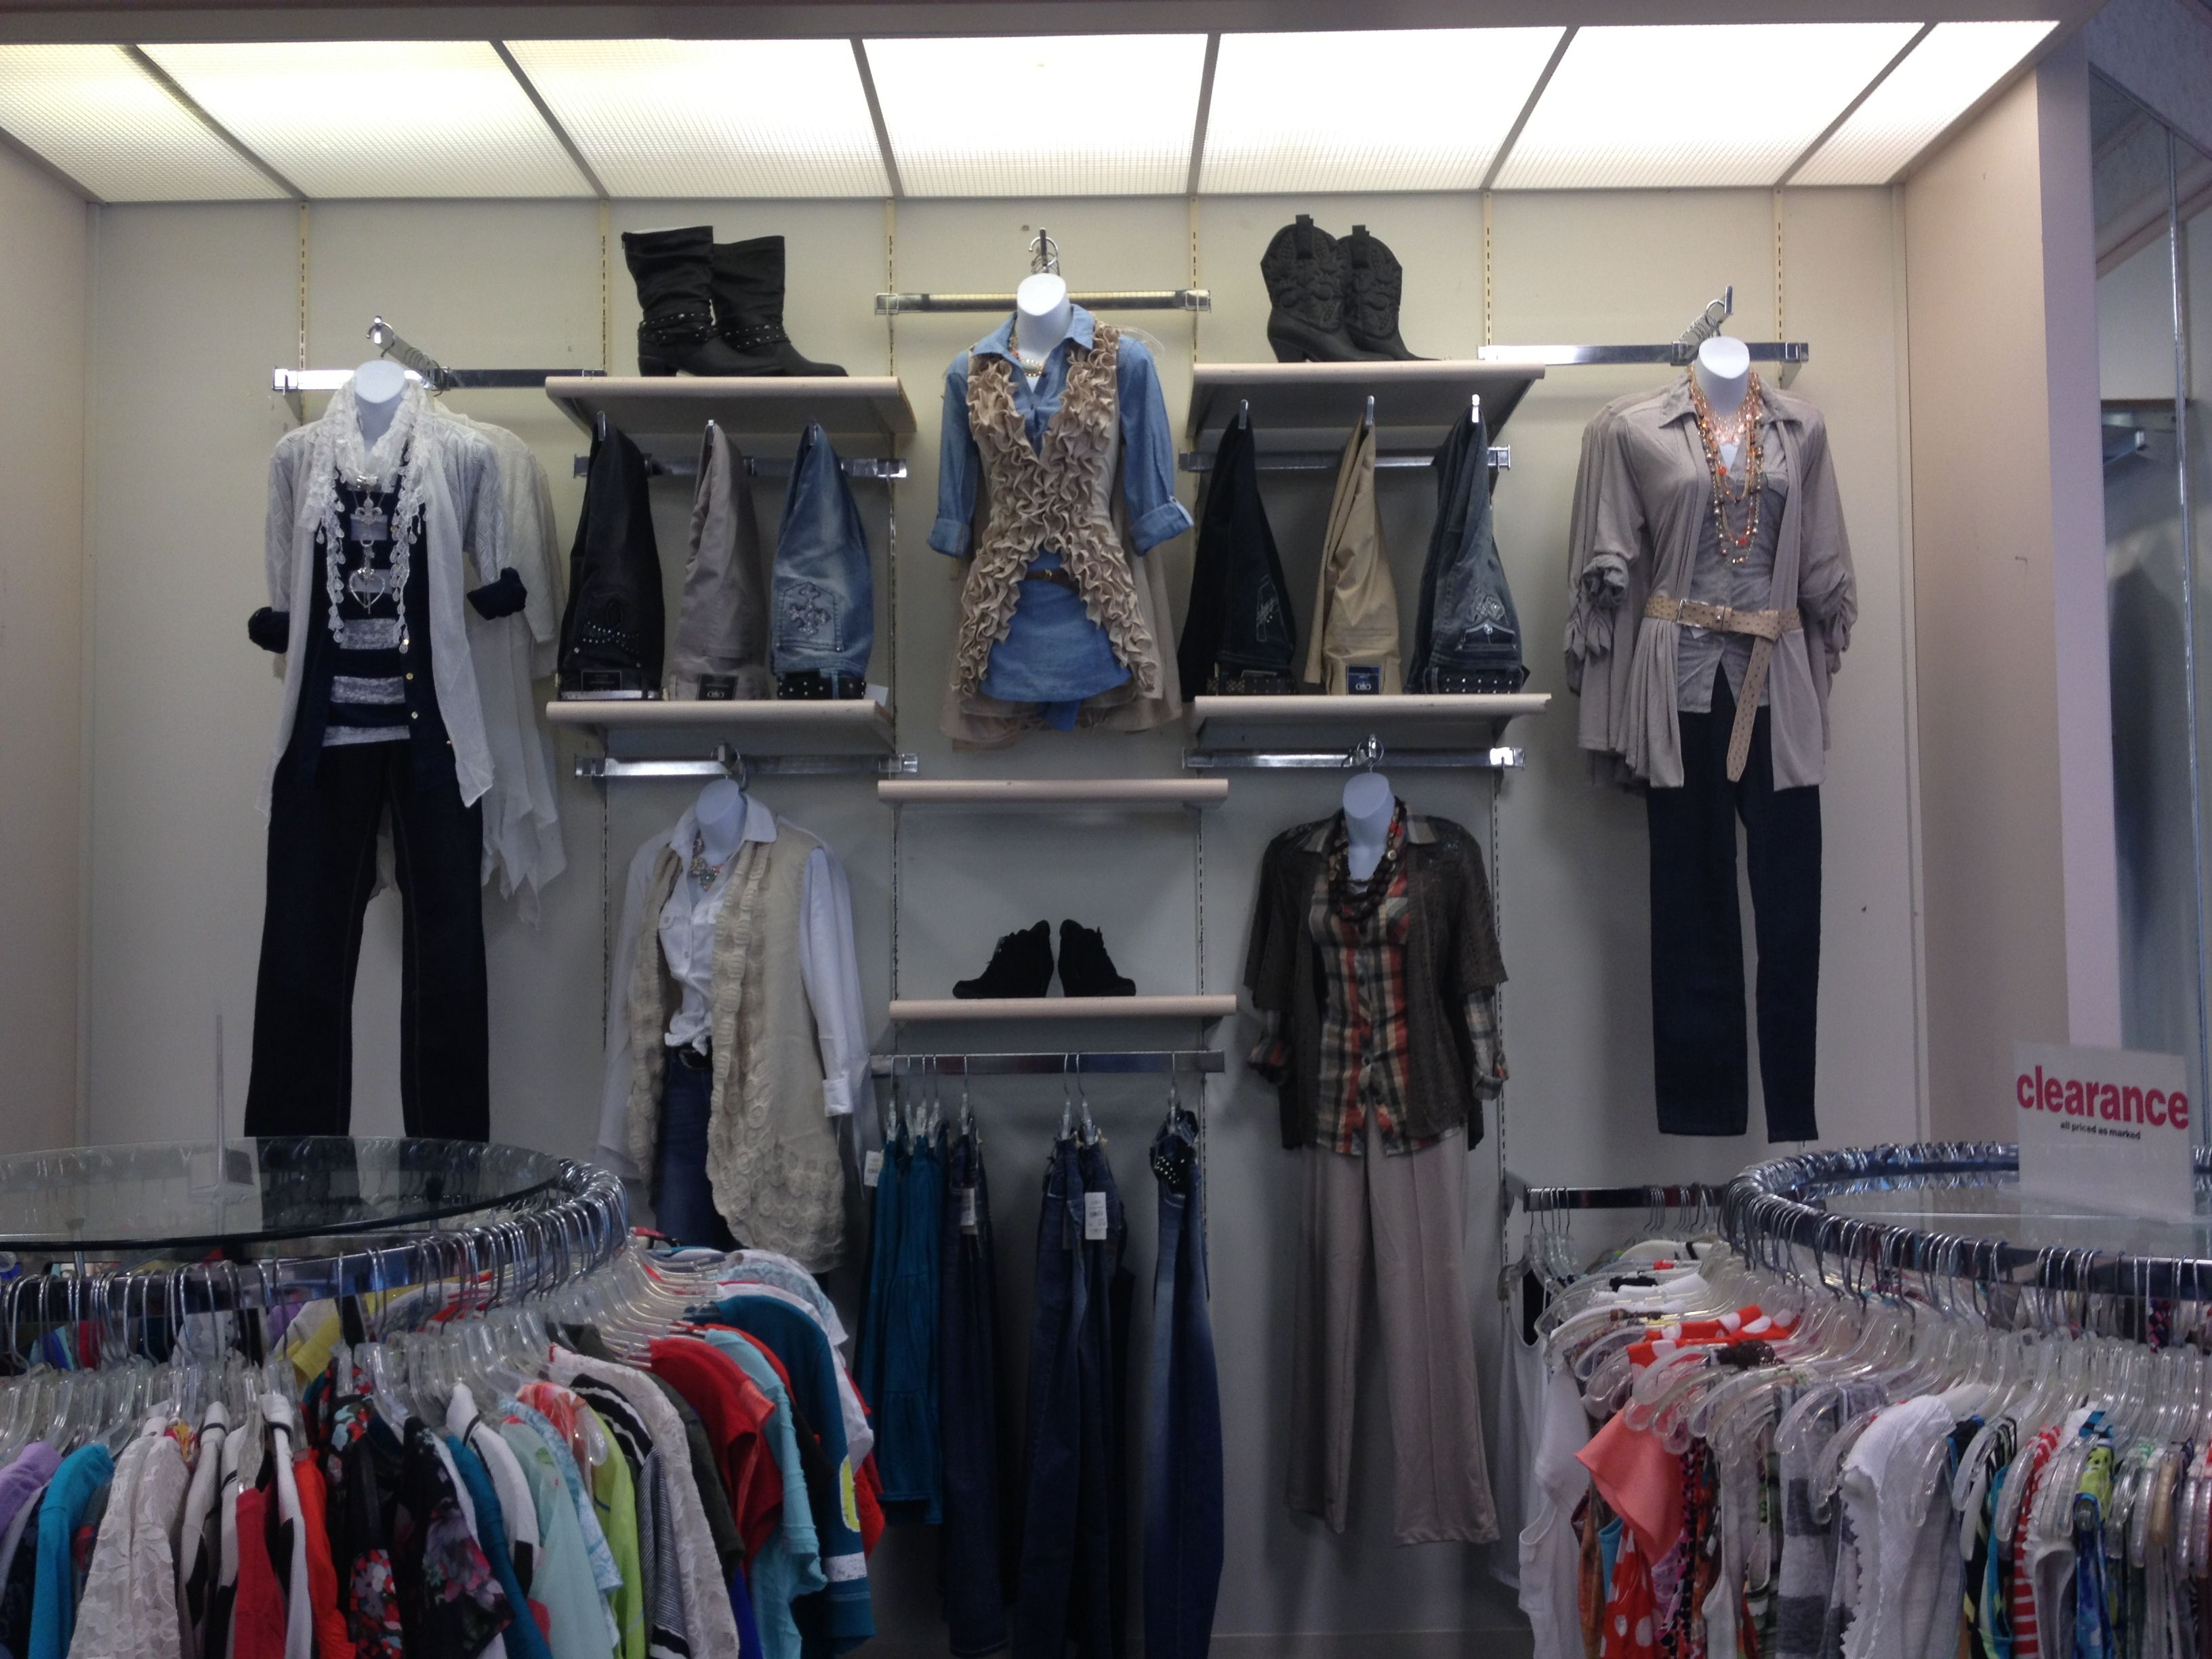 catofashions (With images) Cato fashion, Wardrobe, Fashion